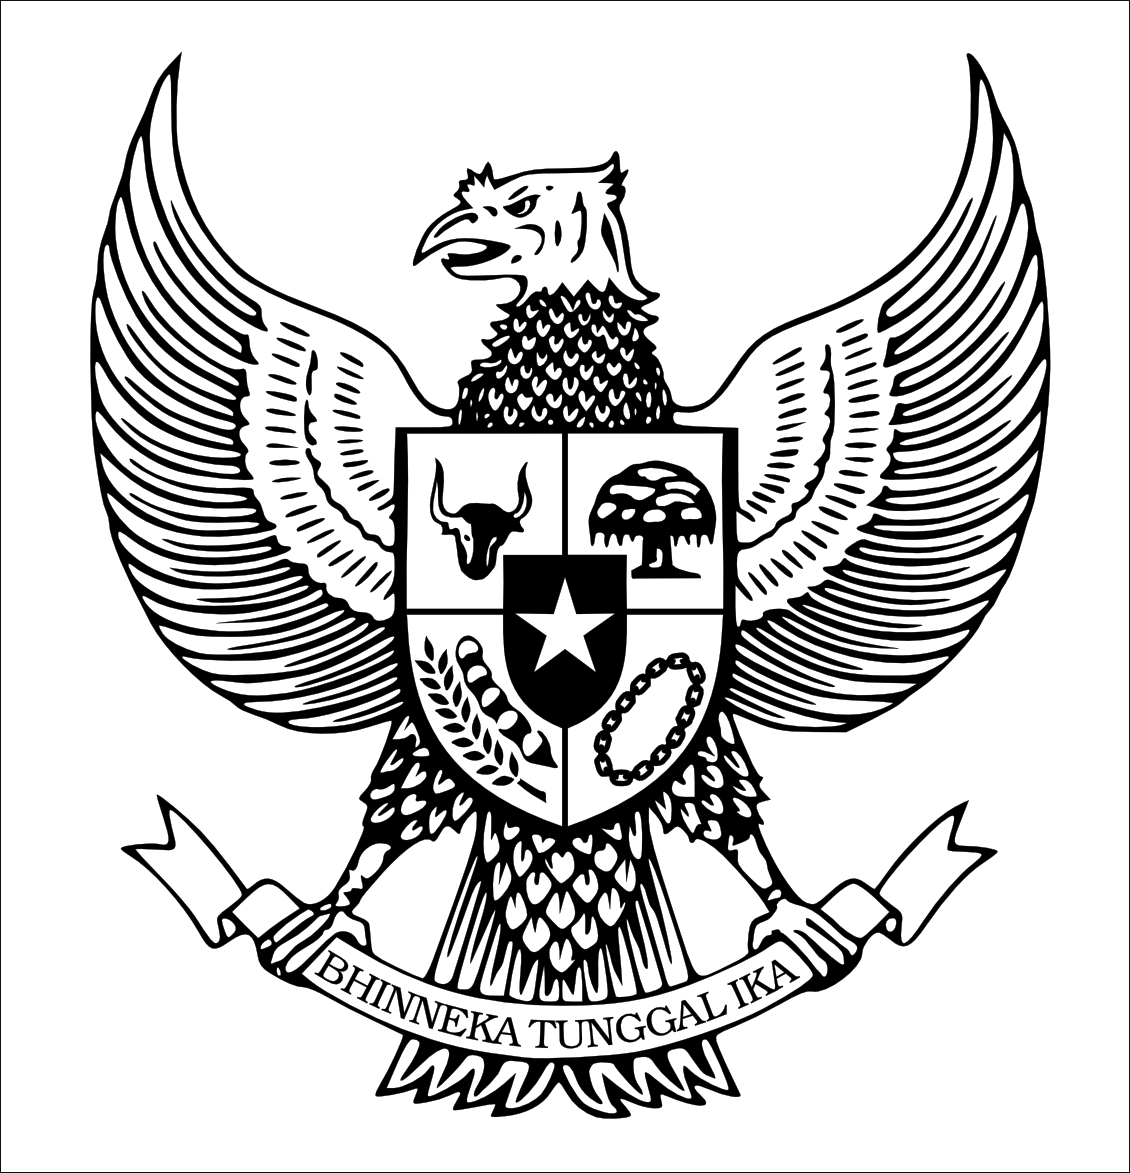 Logo Indonesia dan Dunia LAMBANG BURUNG GARUDA LOGO